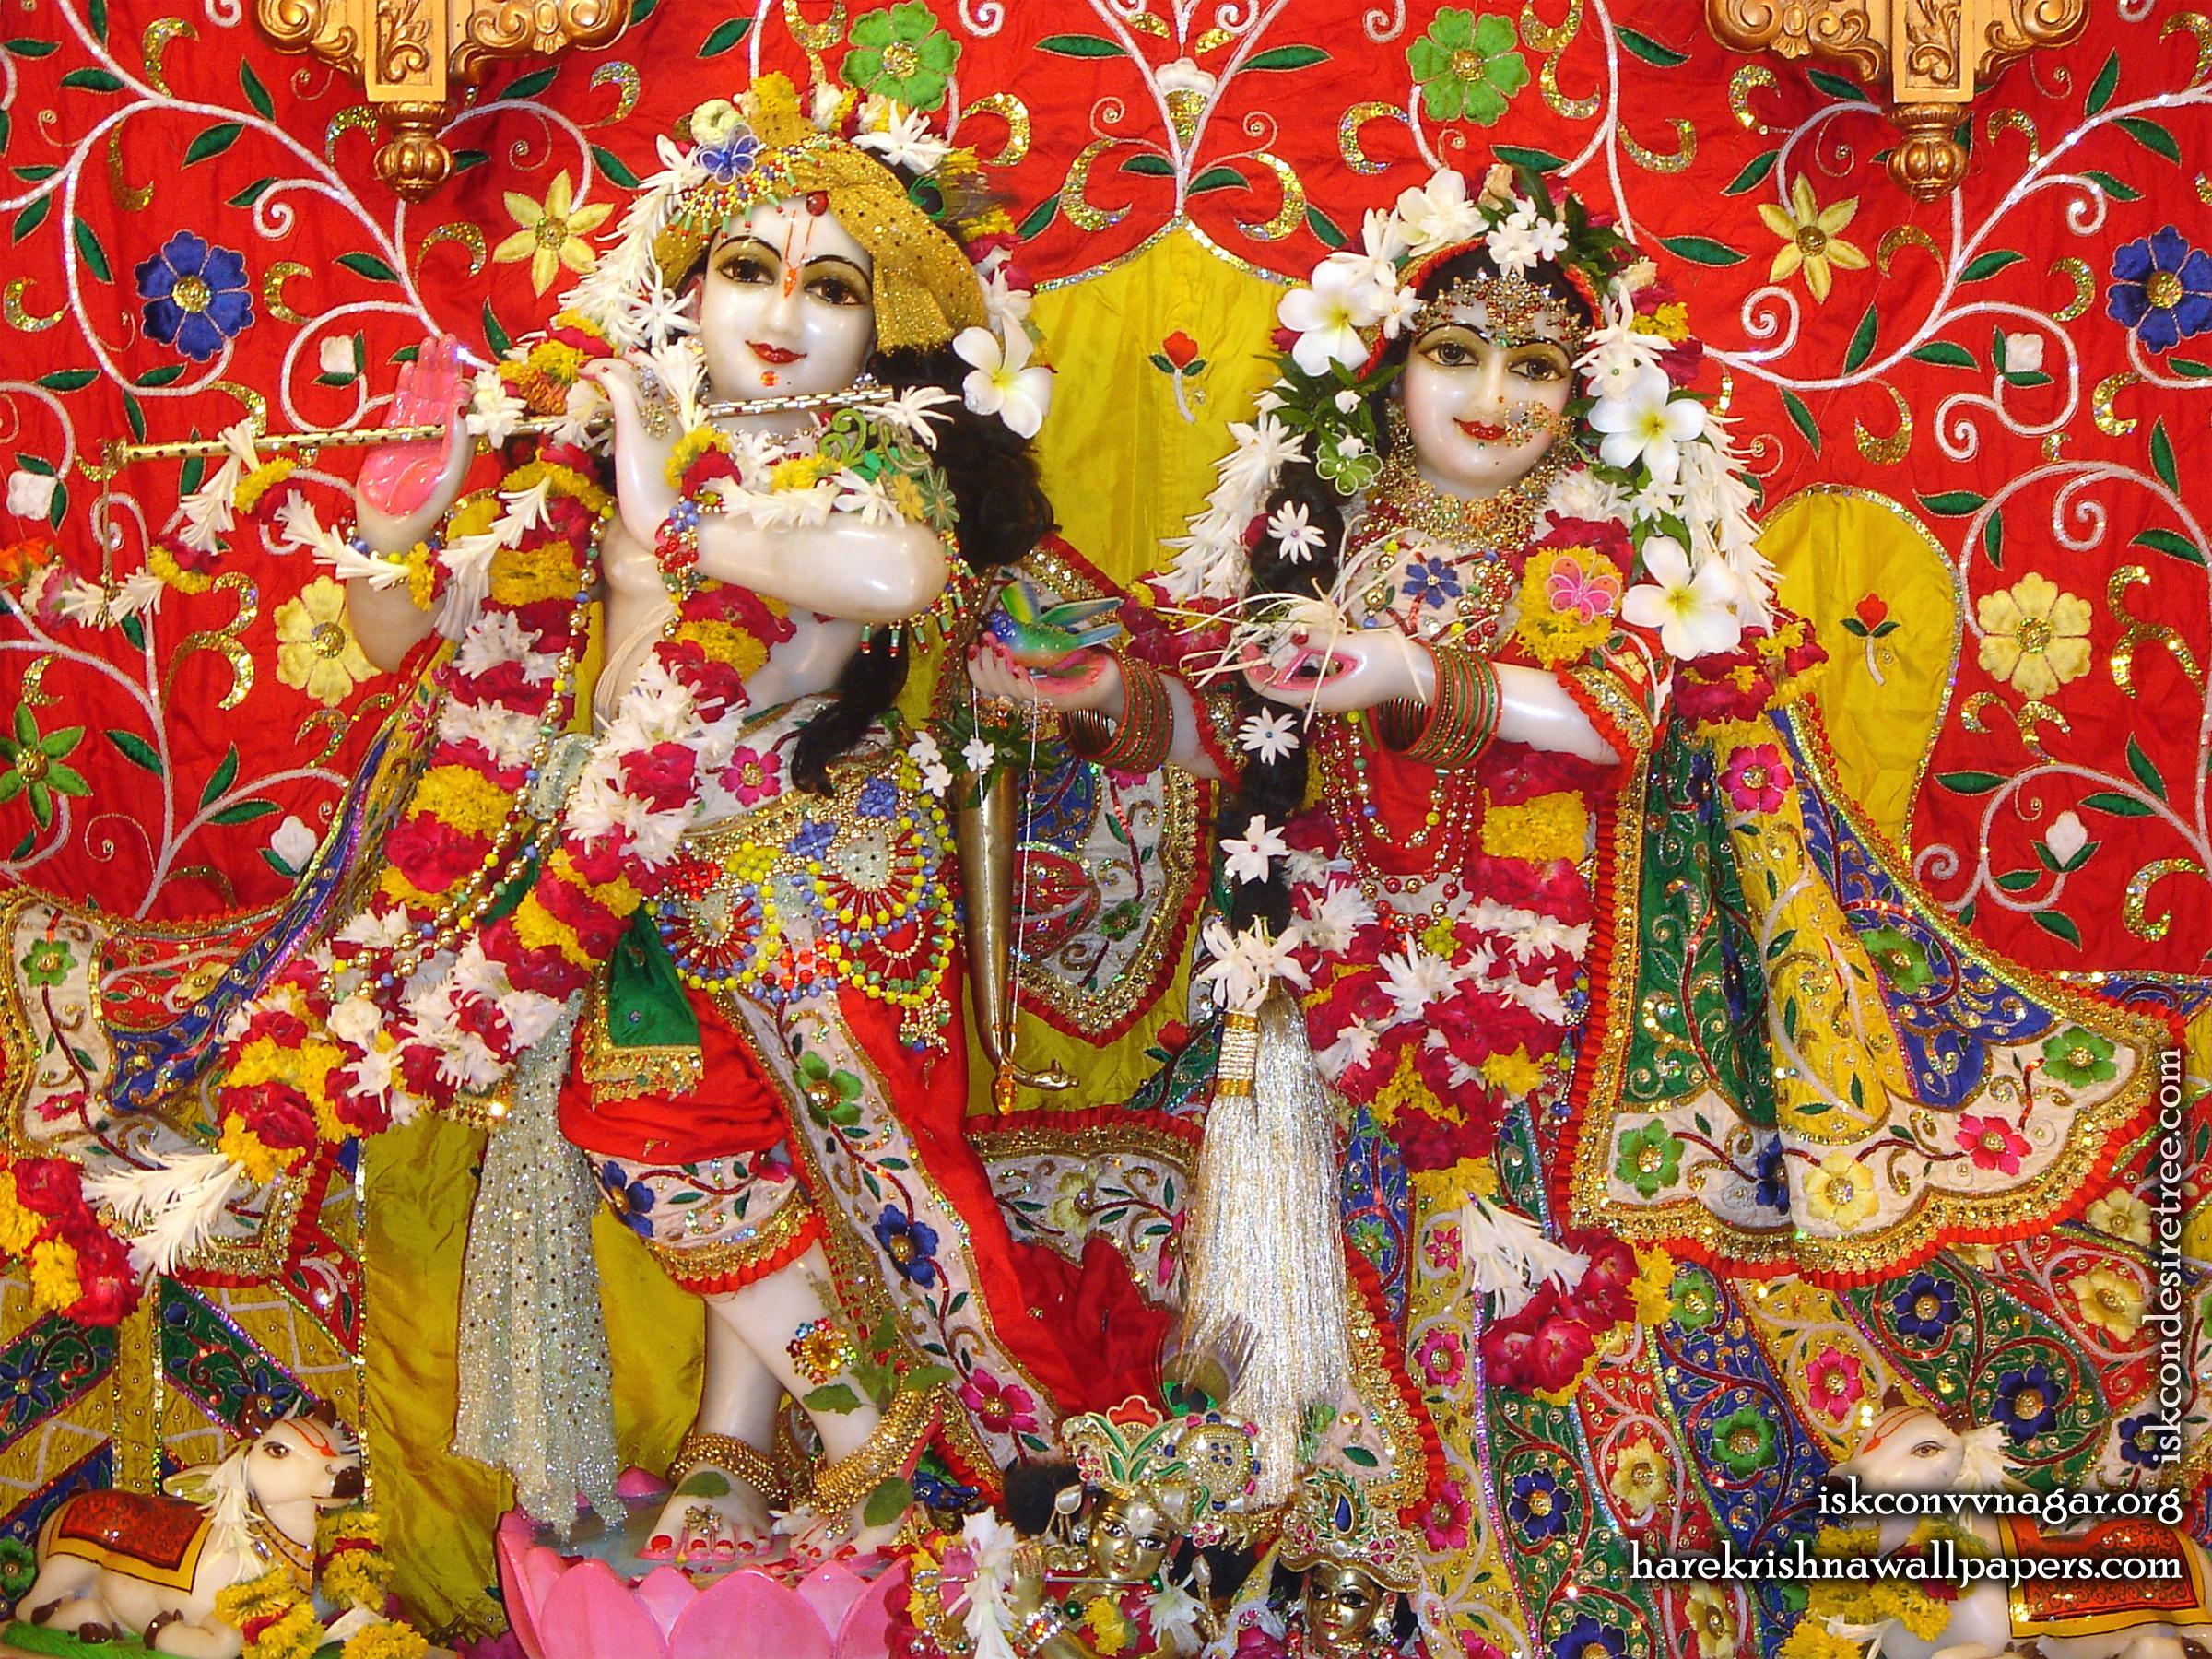 Sri Sri Radha Giridhari Wallpaper (013) Size 2400x1800 Download